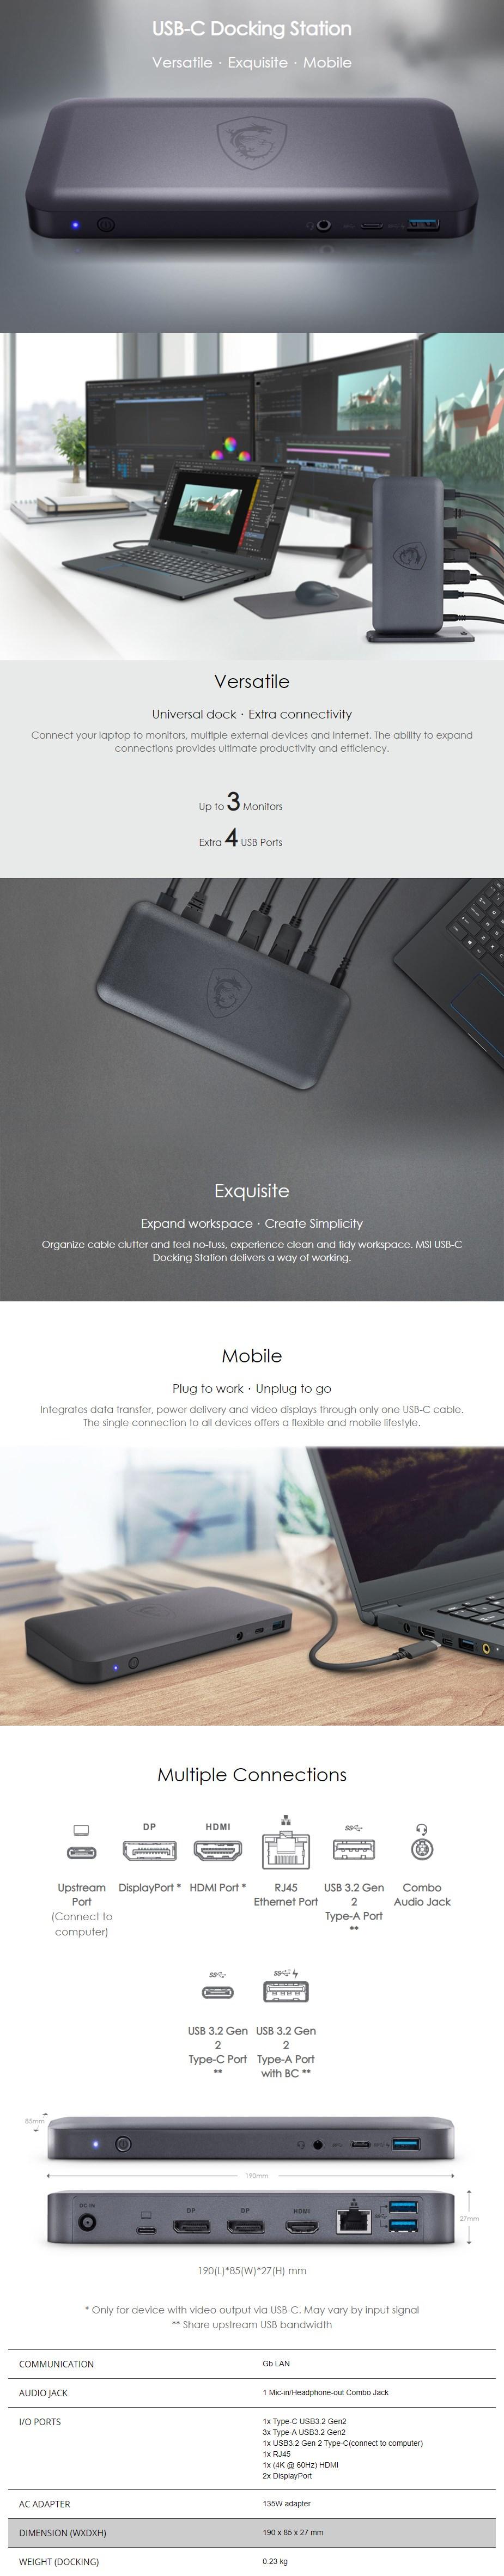 MSI USB-C Docking Station - Overview 1